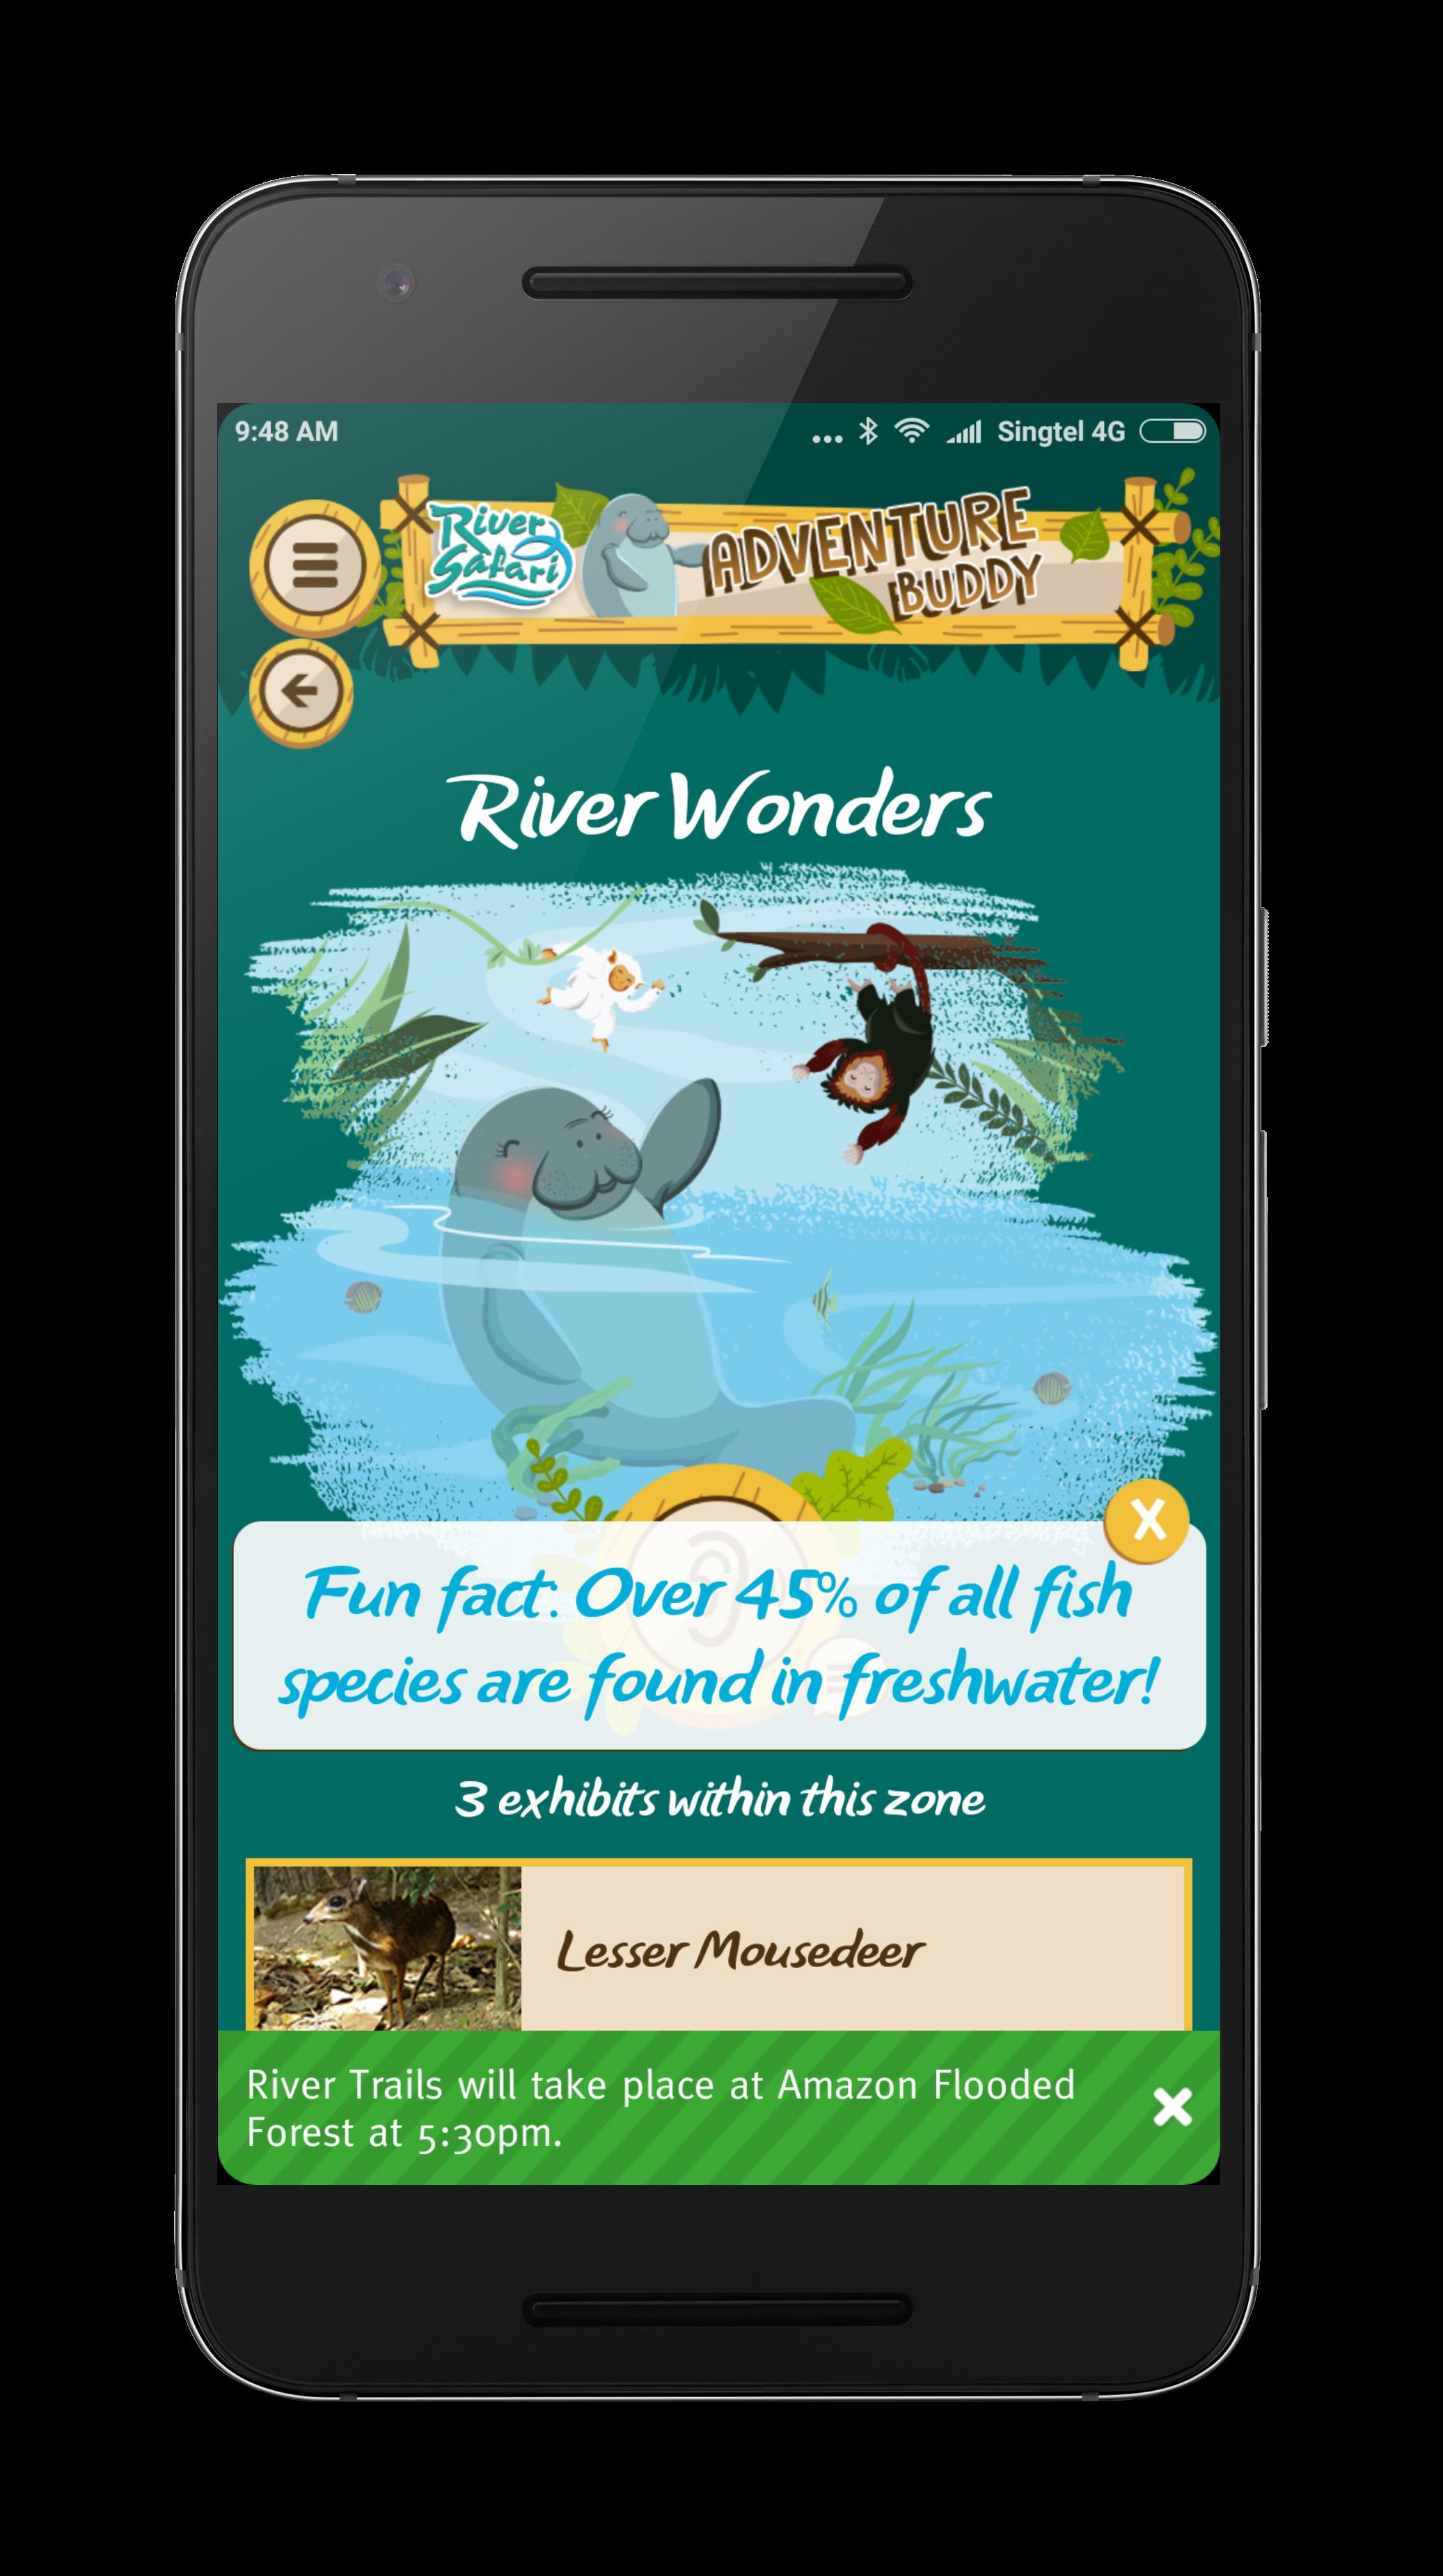 Screenshot_2017-12-14-09-48-42-969_us.originally.river_safari_android_framed